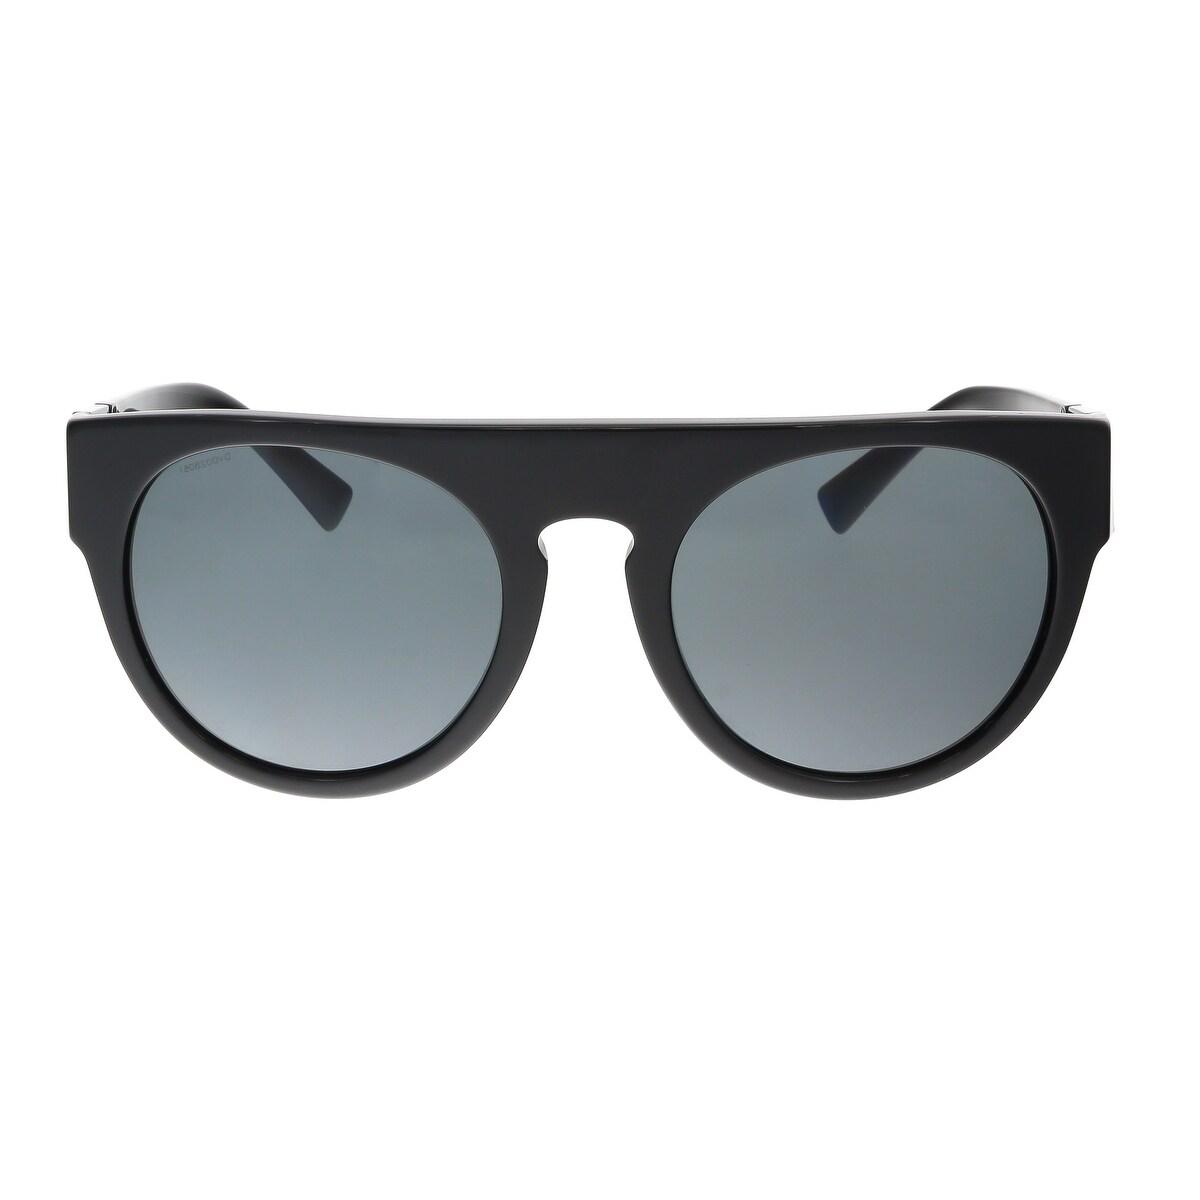 1c371aad76 Shop Versace VE4333 523287 Black Round Greca Sunglasses - Free Shipping  Today - Overstock - 15326314